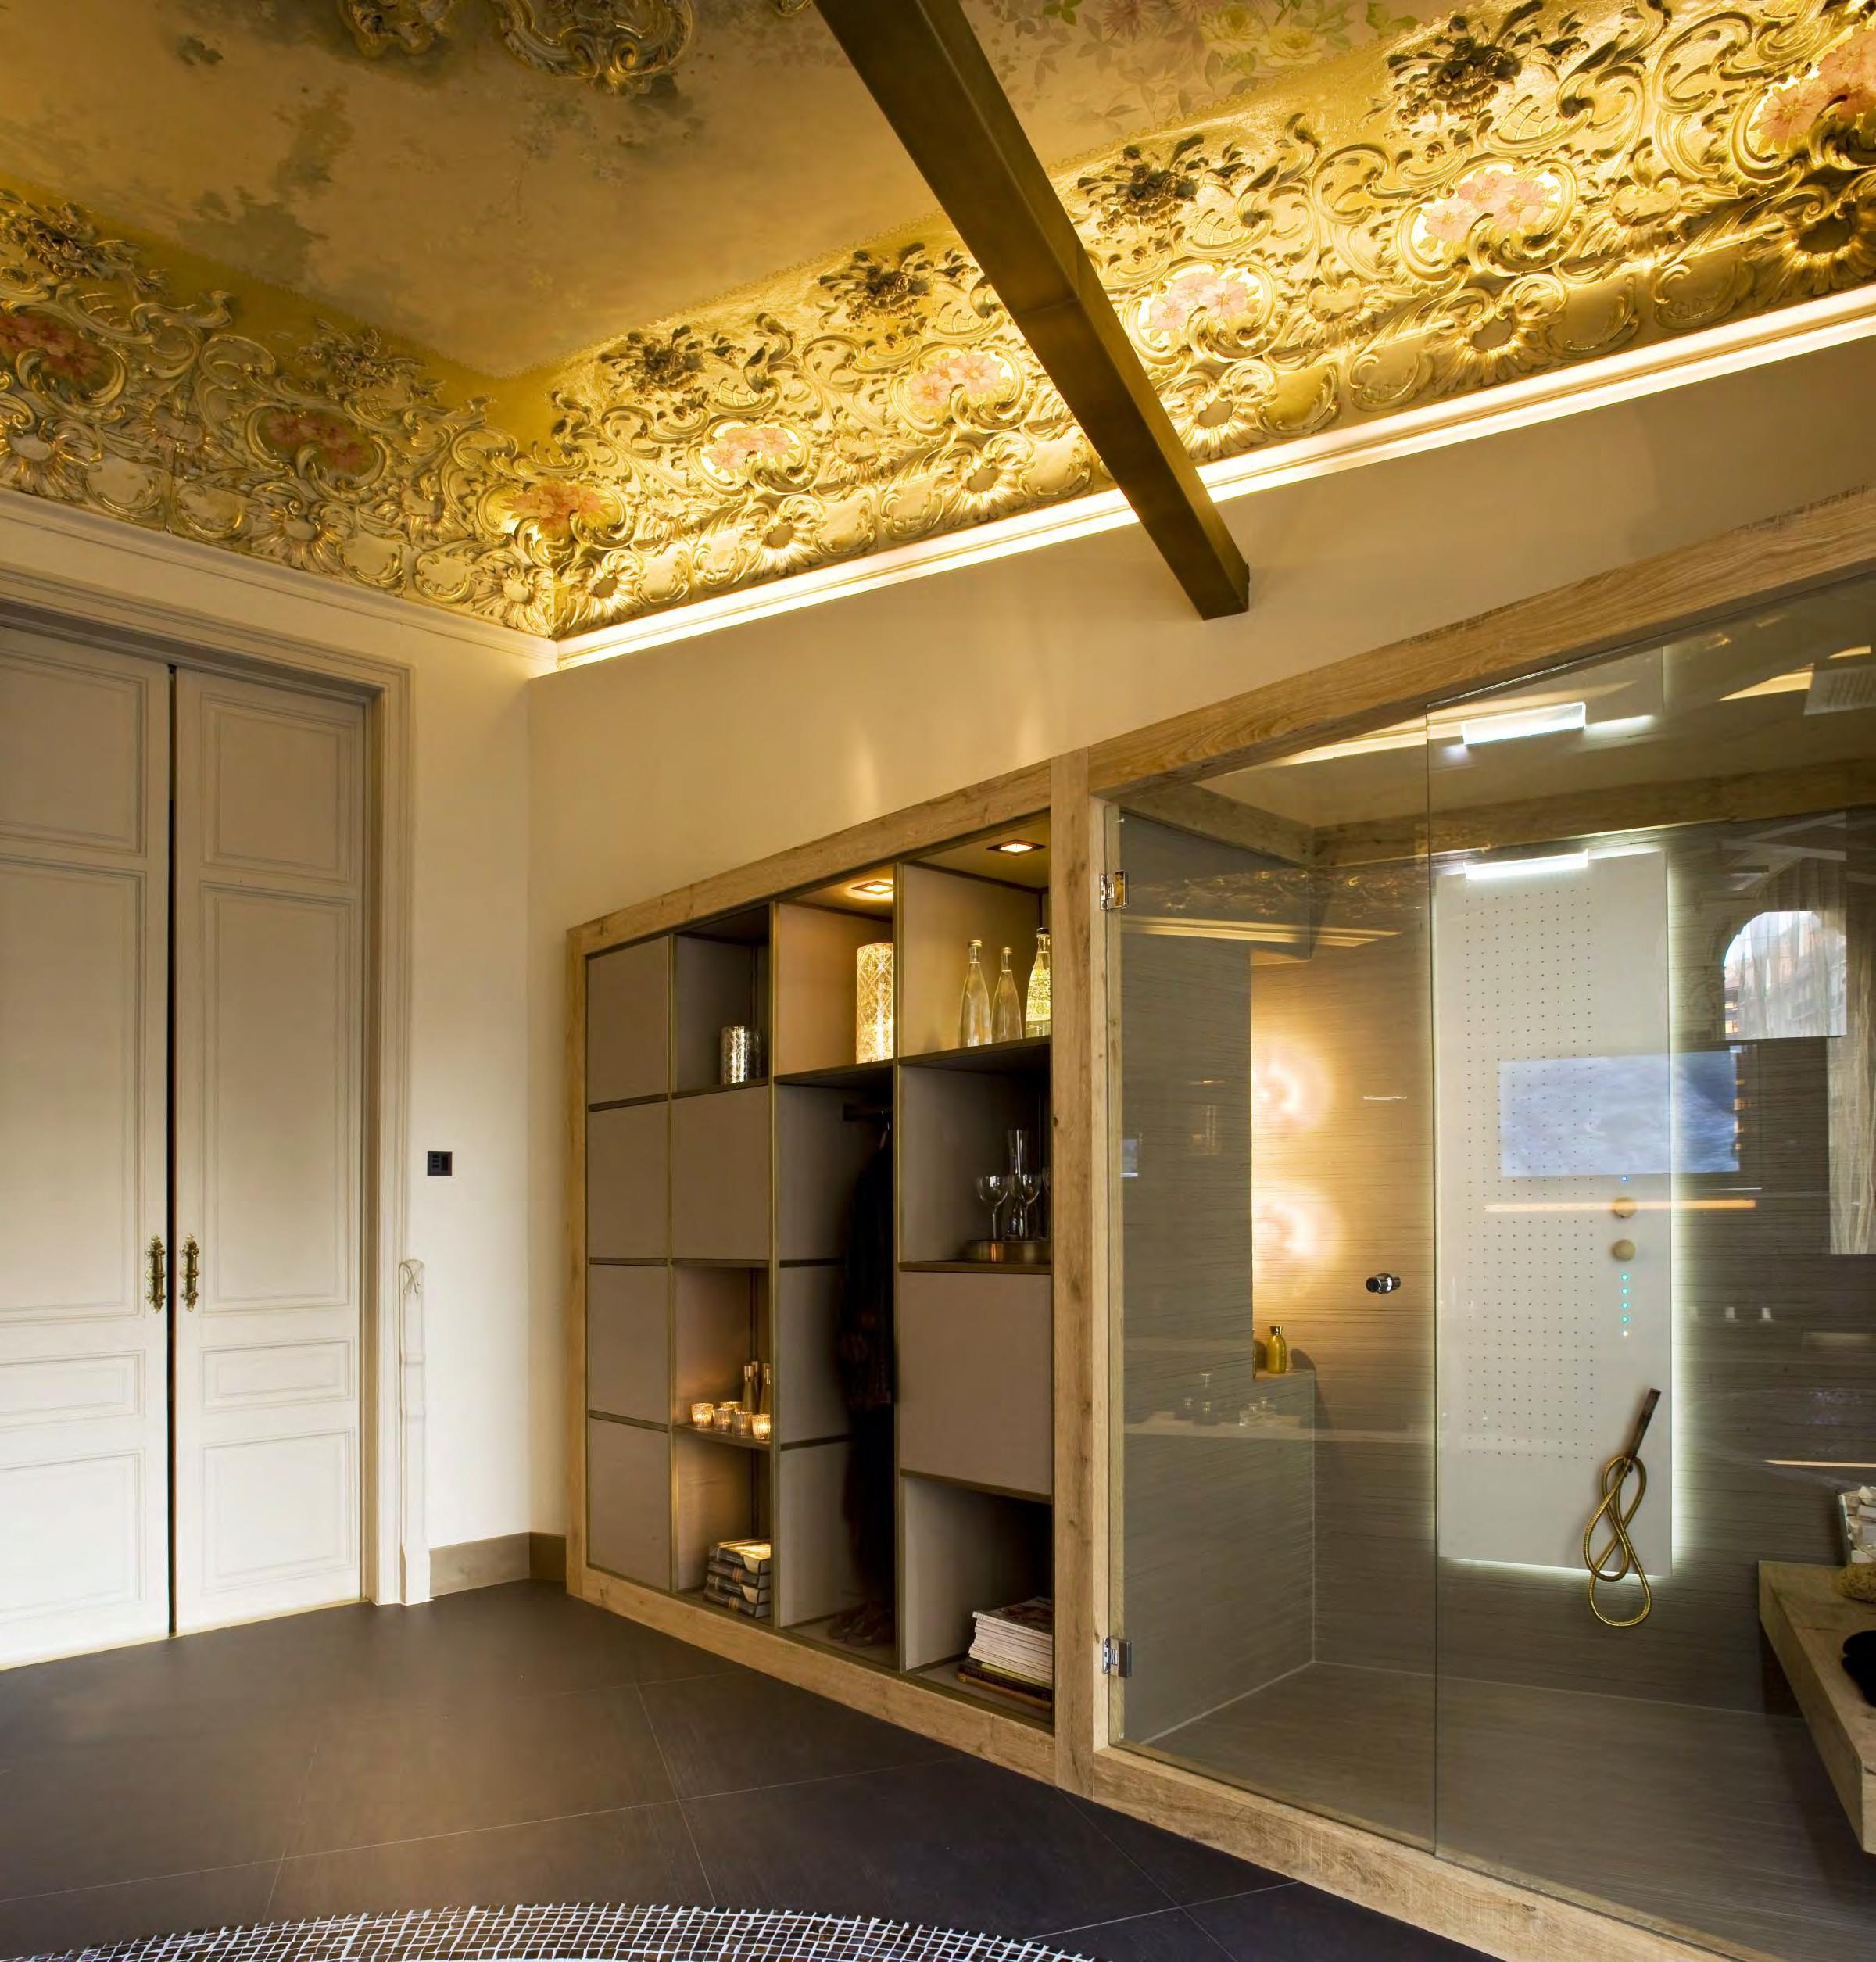 Coblonal interiorismo ba o con sauna casa decor interiores y ba os Interiorismo banos modernos